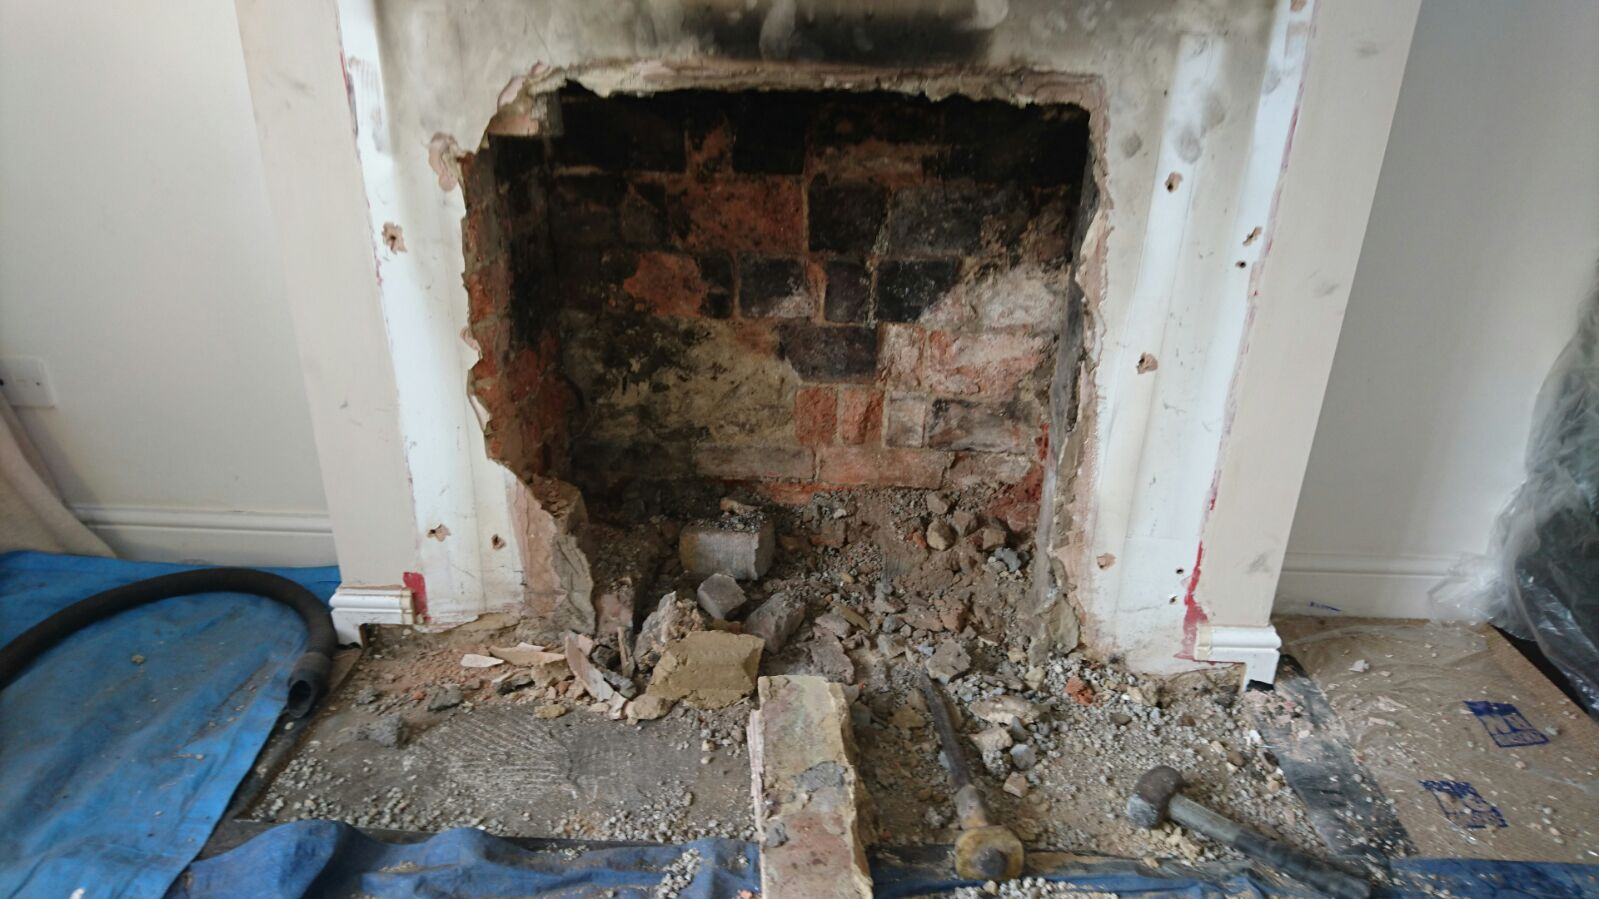 Rental Cottage Helmdon Brackley Banbury Chimney Sweeping